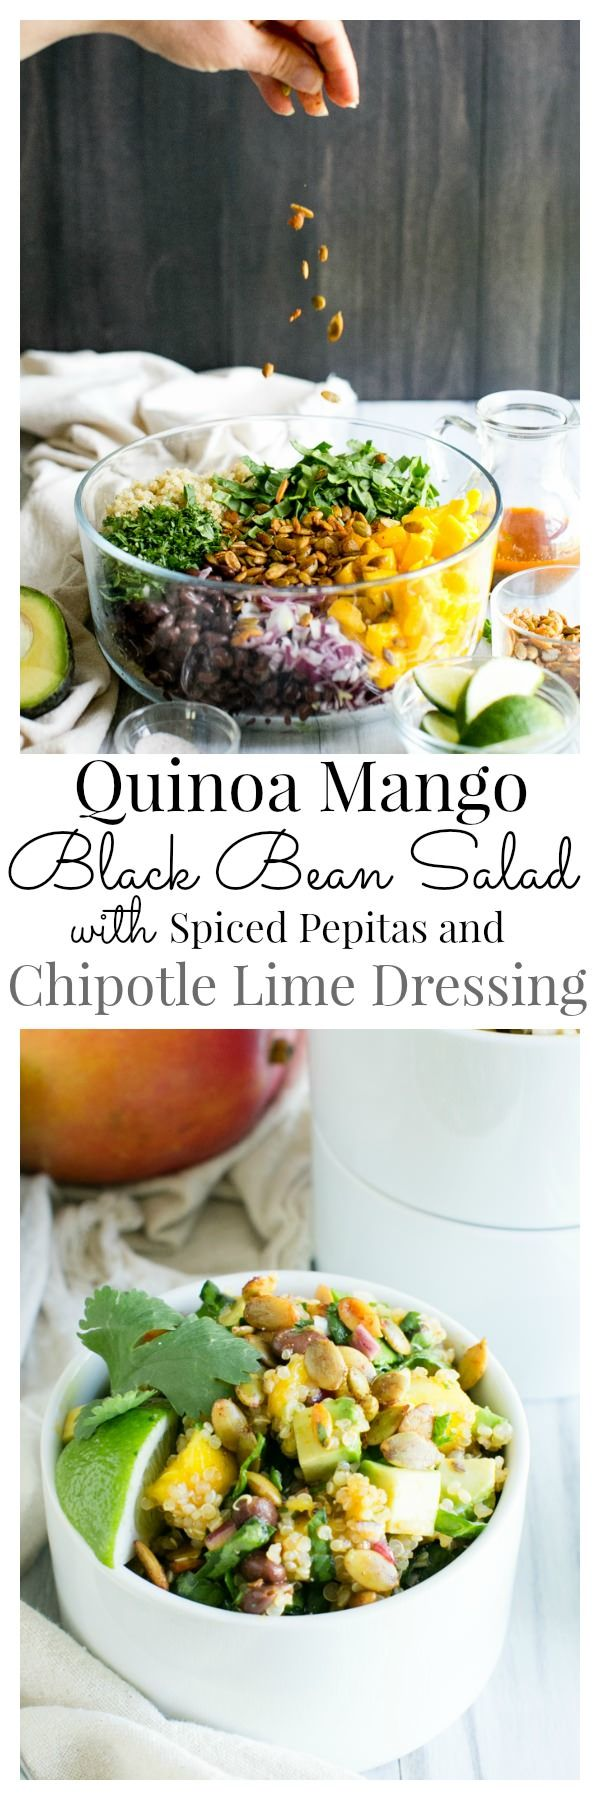 Quinoa Mango Black Bean Salad with Smoky Pepitas and Chipotle Lime Vinaigrette | Vanilla And Bean